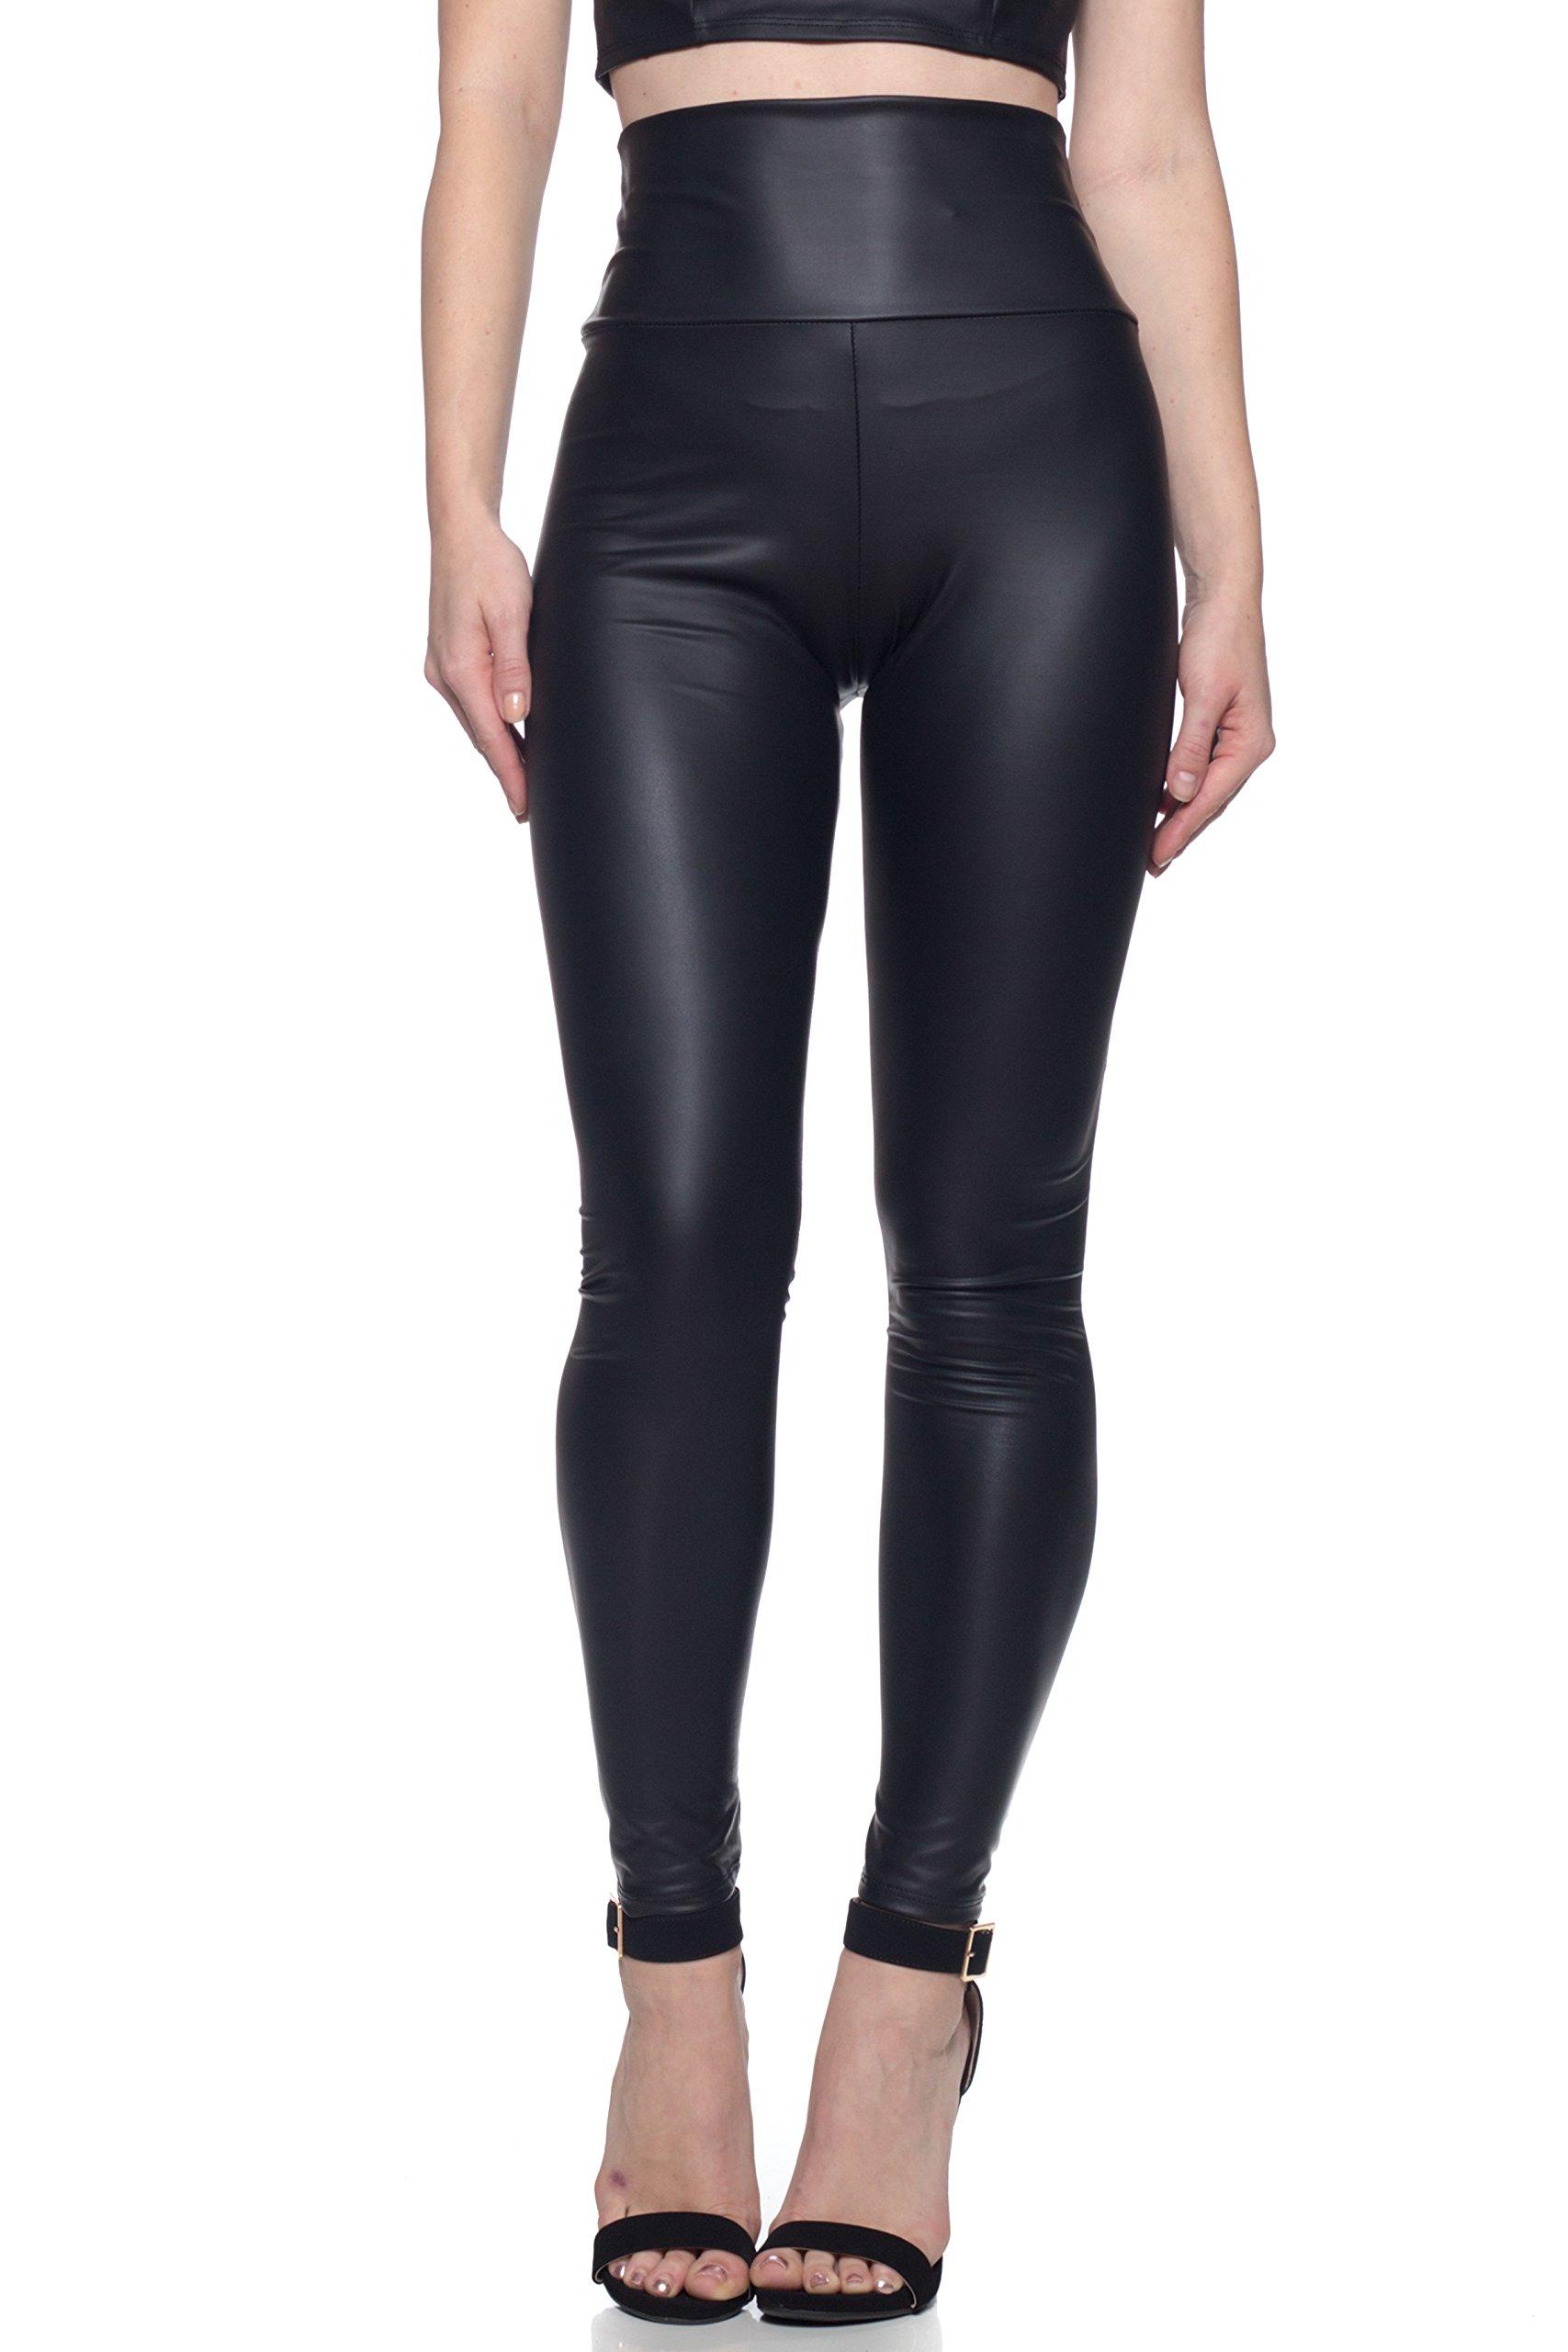 Cemi Ceri J2 Love Women's Junior Plus Faux Leather High Waist Leggings, 4X, Black